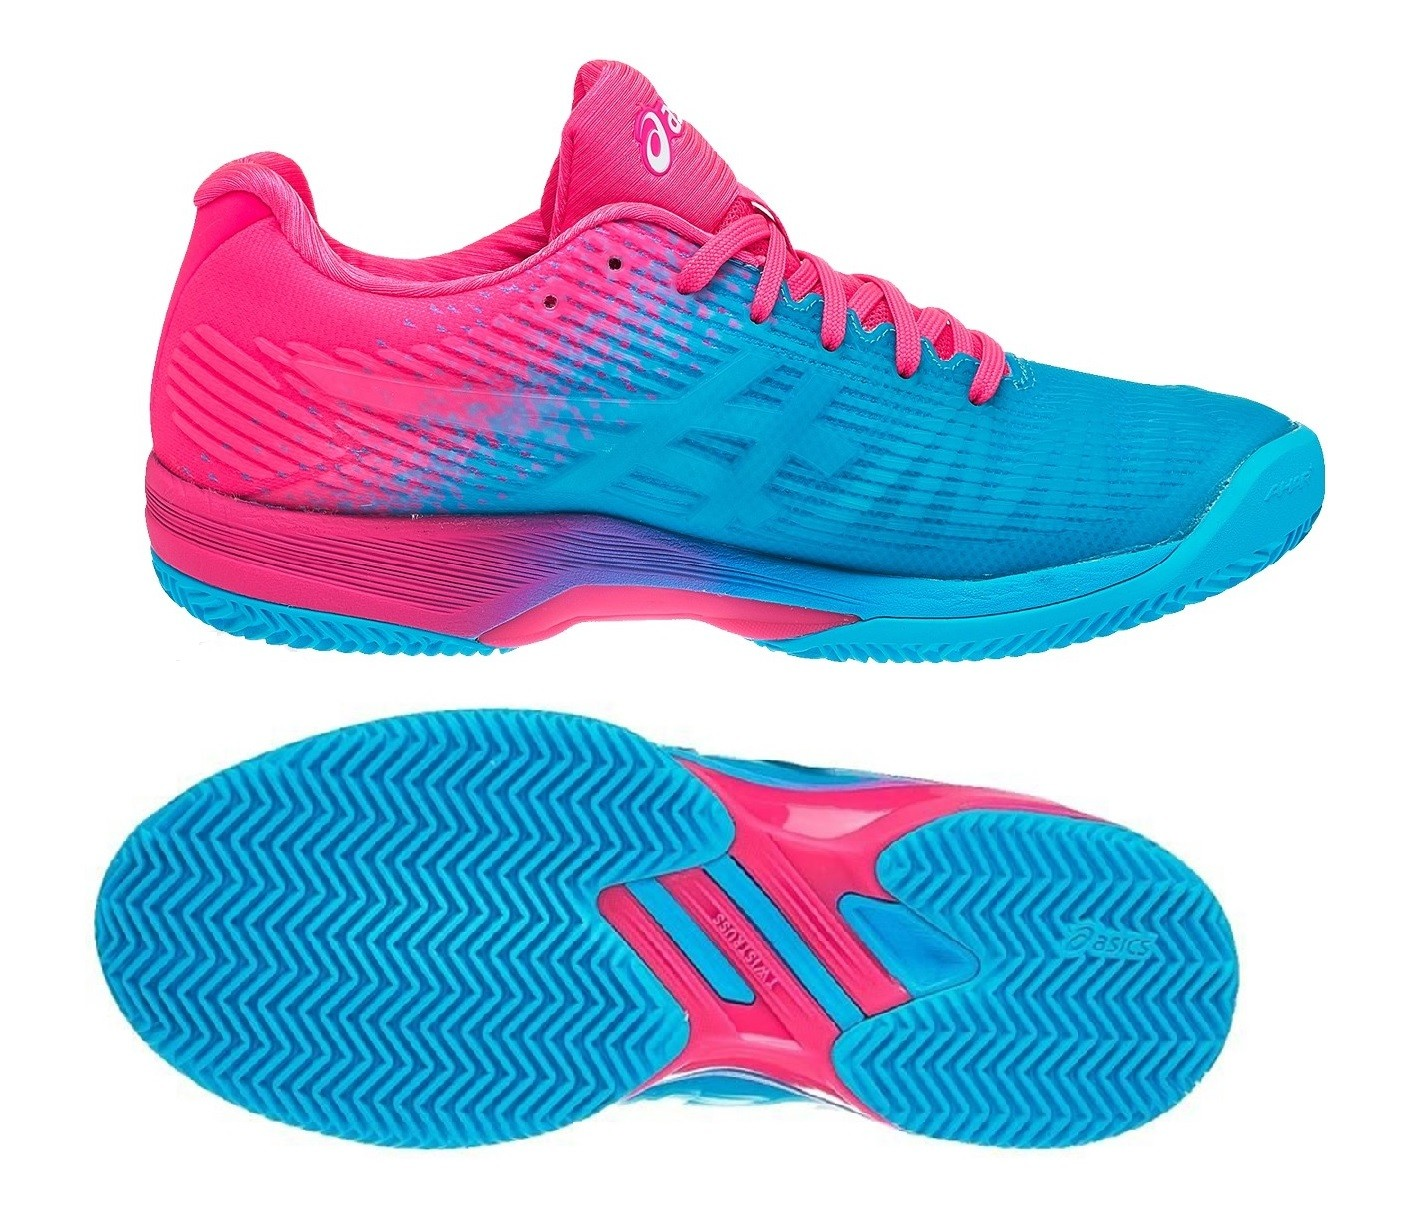 922e18c68ea5 Dámská tenisová obuv Asics Solution Speed FF Clay L.E